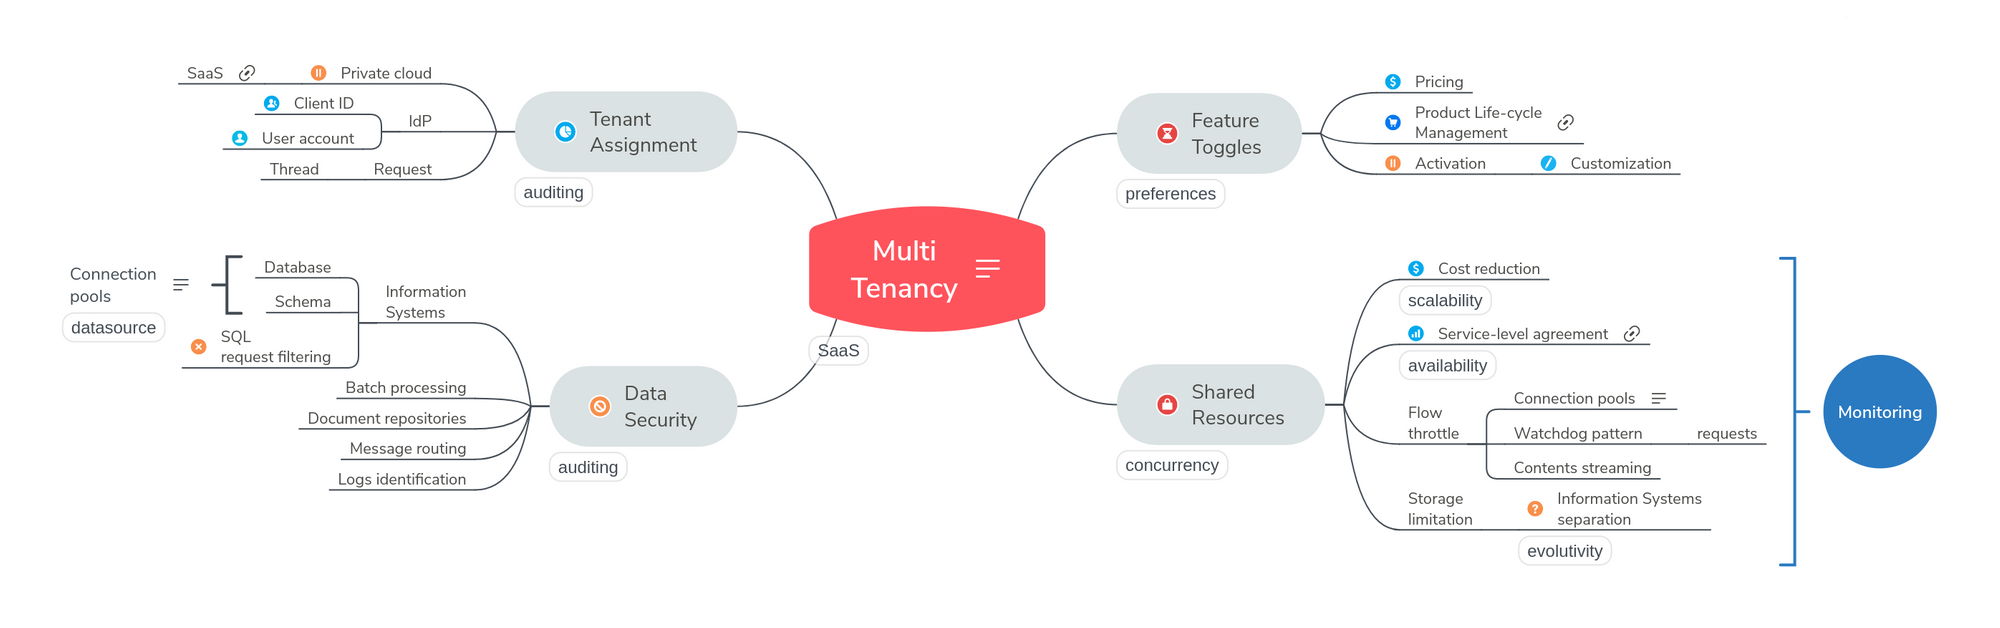 Multi-Tenancy-1